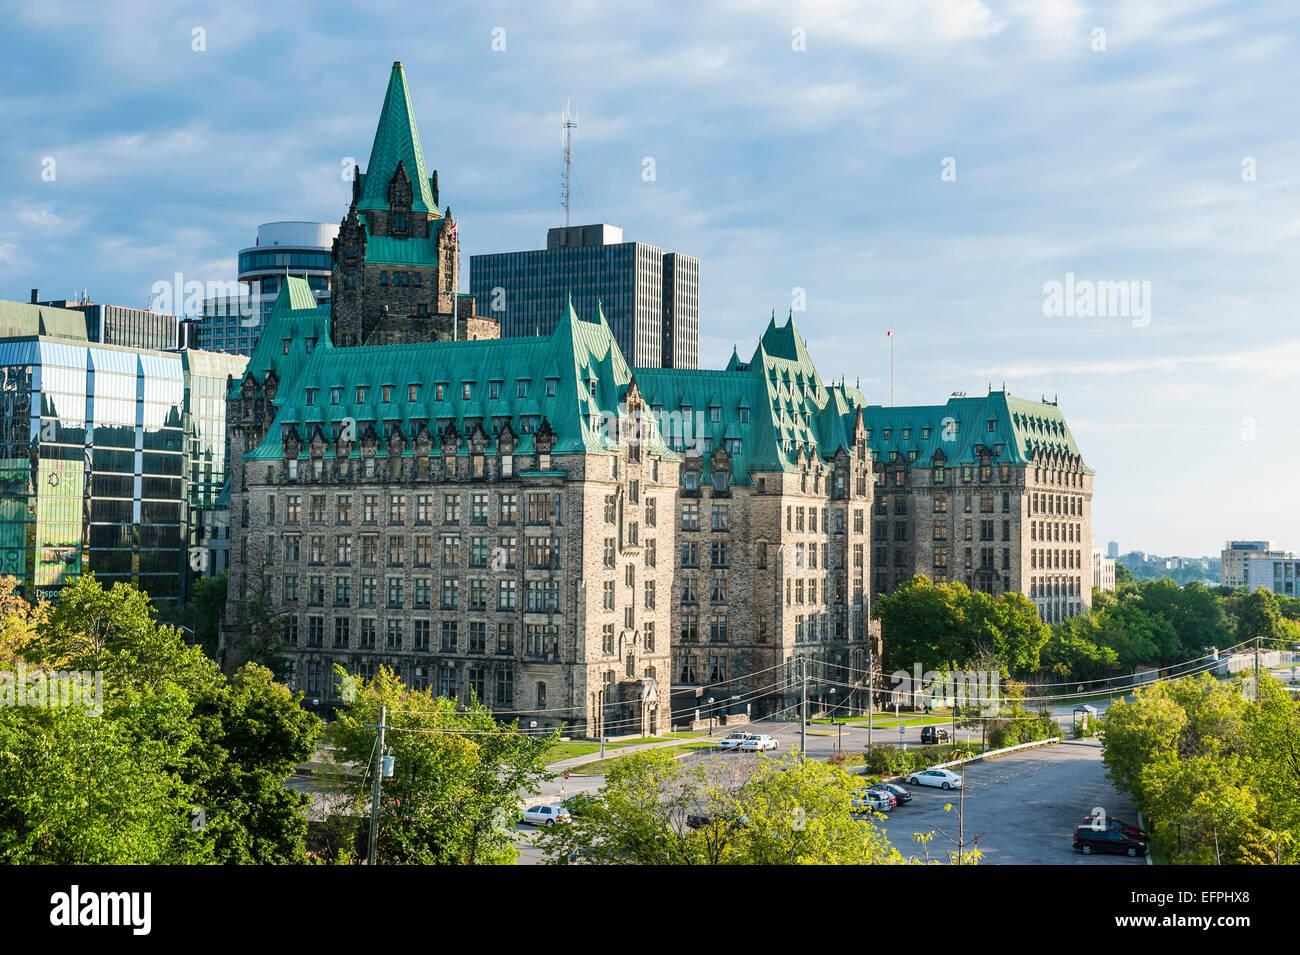 Confederation building in the center of Ottawa, Ontario, Canada, North America - Stock Image